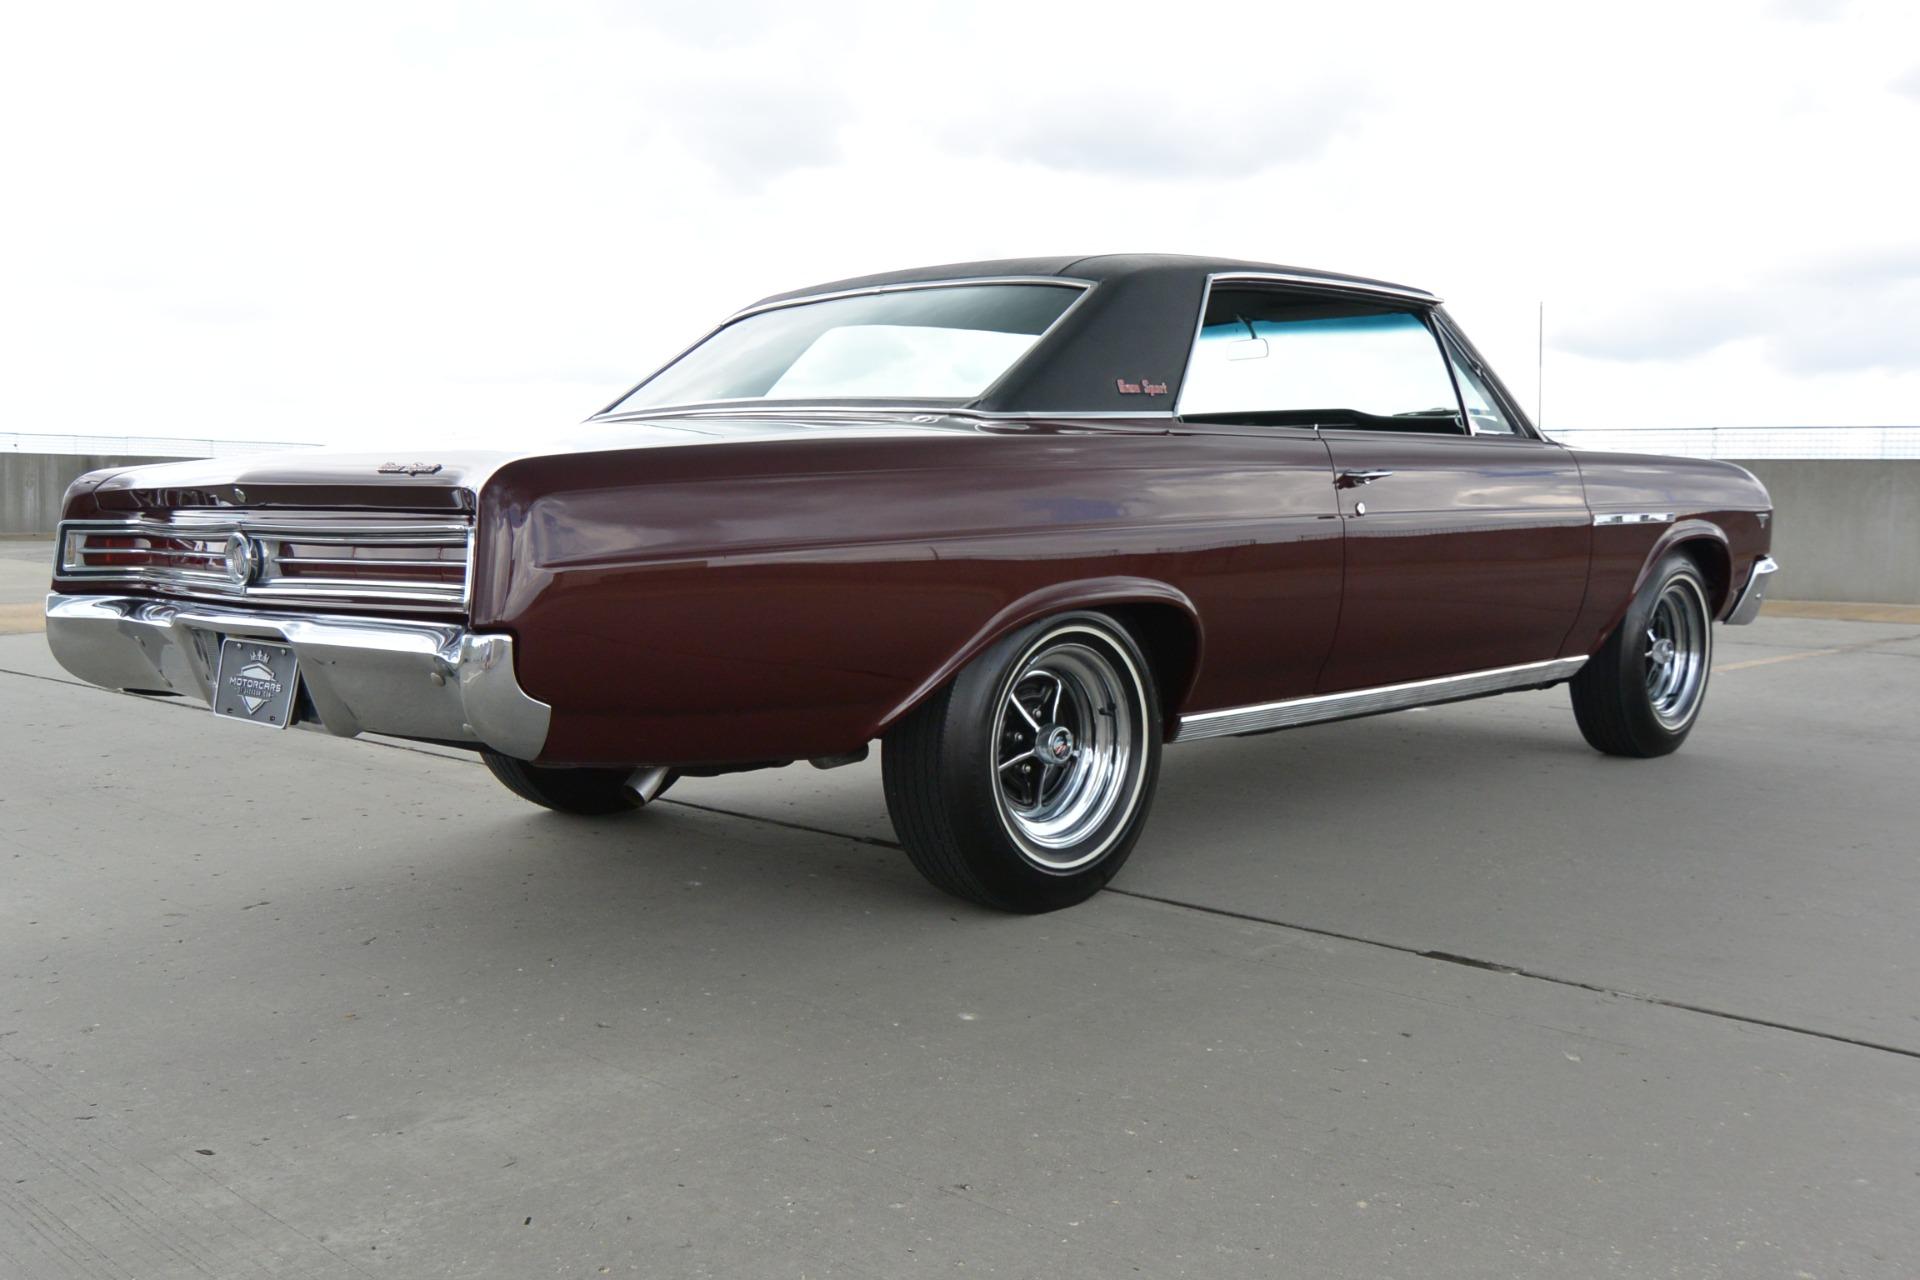 Used-1965-Buick-Skylark-Gran-Sport-**-151K-Restoration-**-Jackson-MS